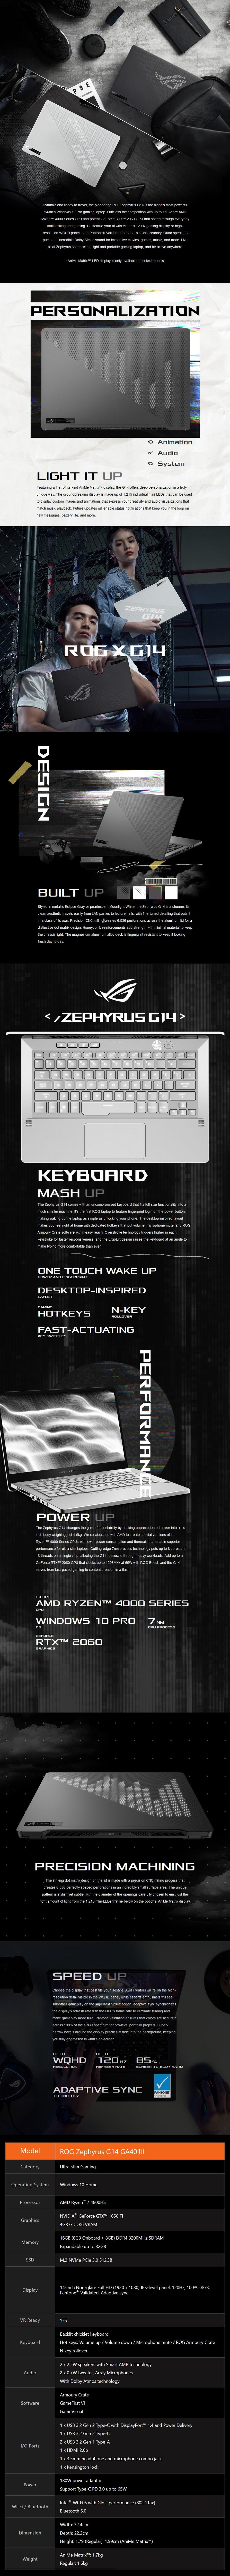 asus-rog-zephyrus-g14-14-120hz-gaming-laptop-ryzen-7-16gb-512gb-1650ti-grey-ac33640-1.jpg